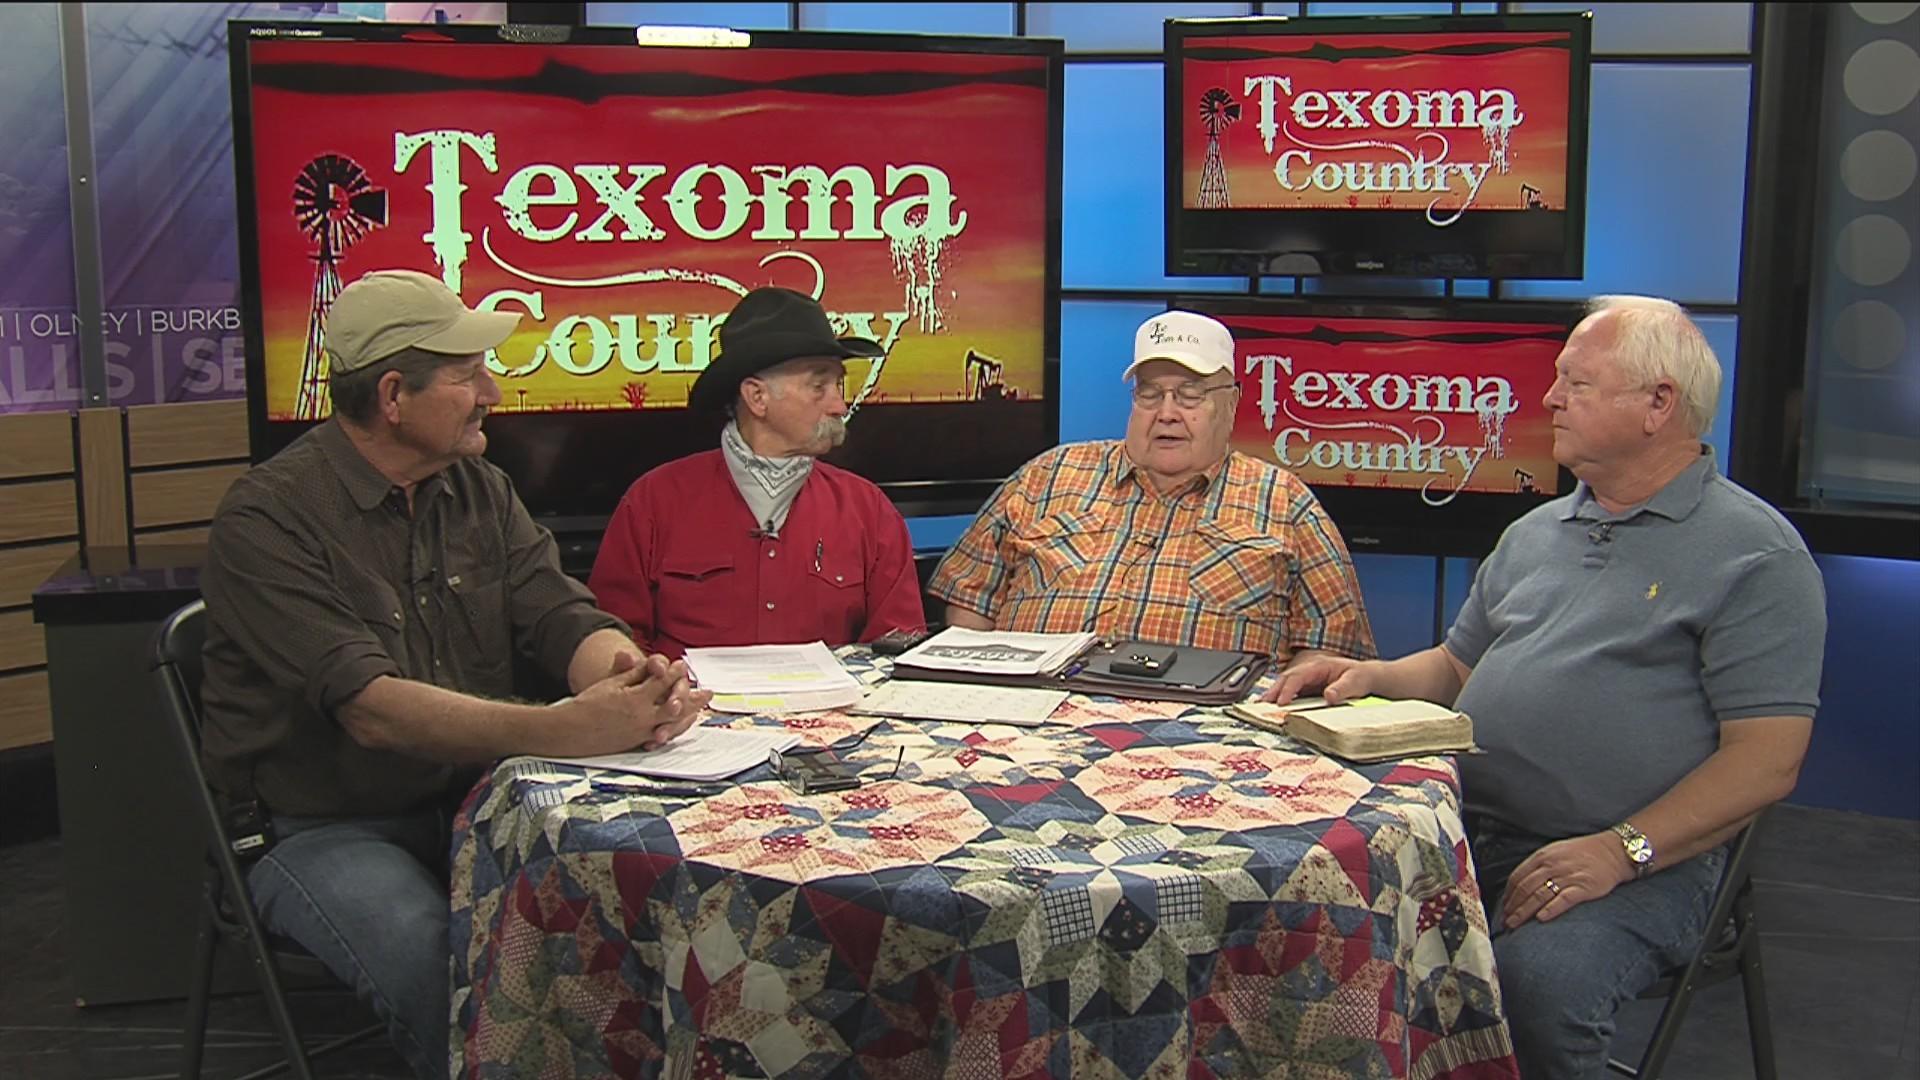 Texoma Country Morning 11/23/18 4